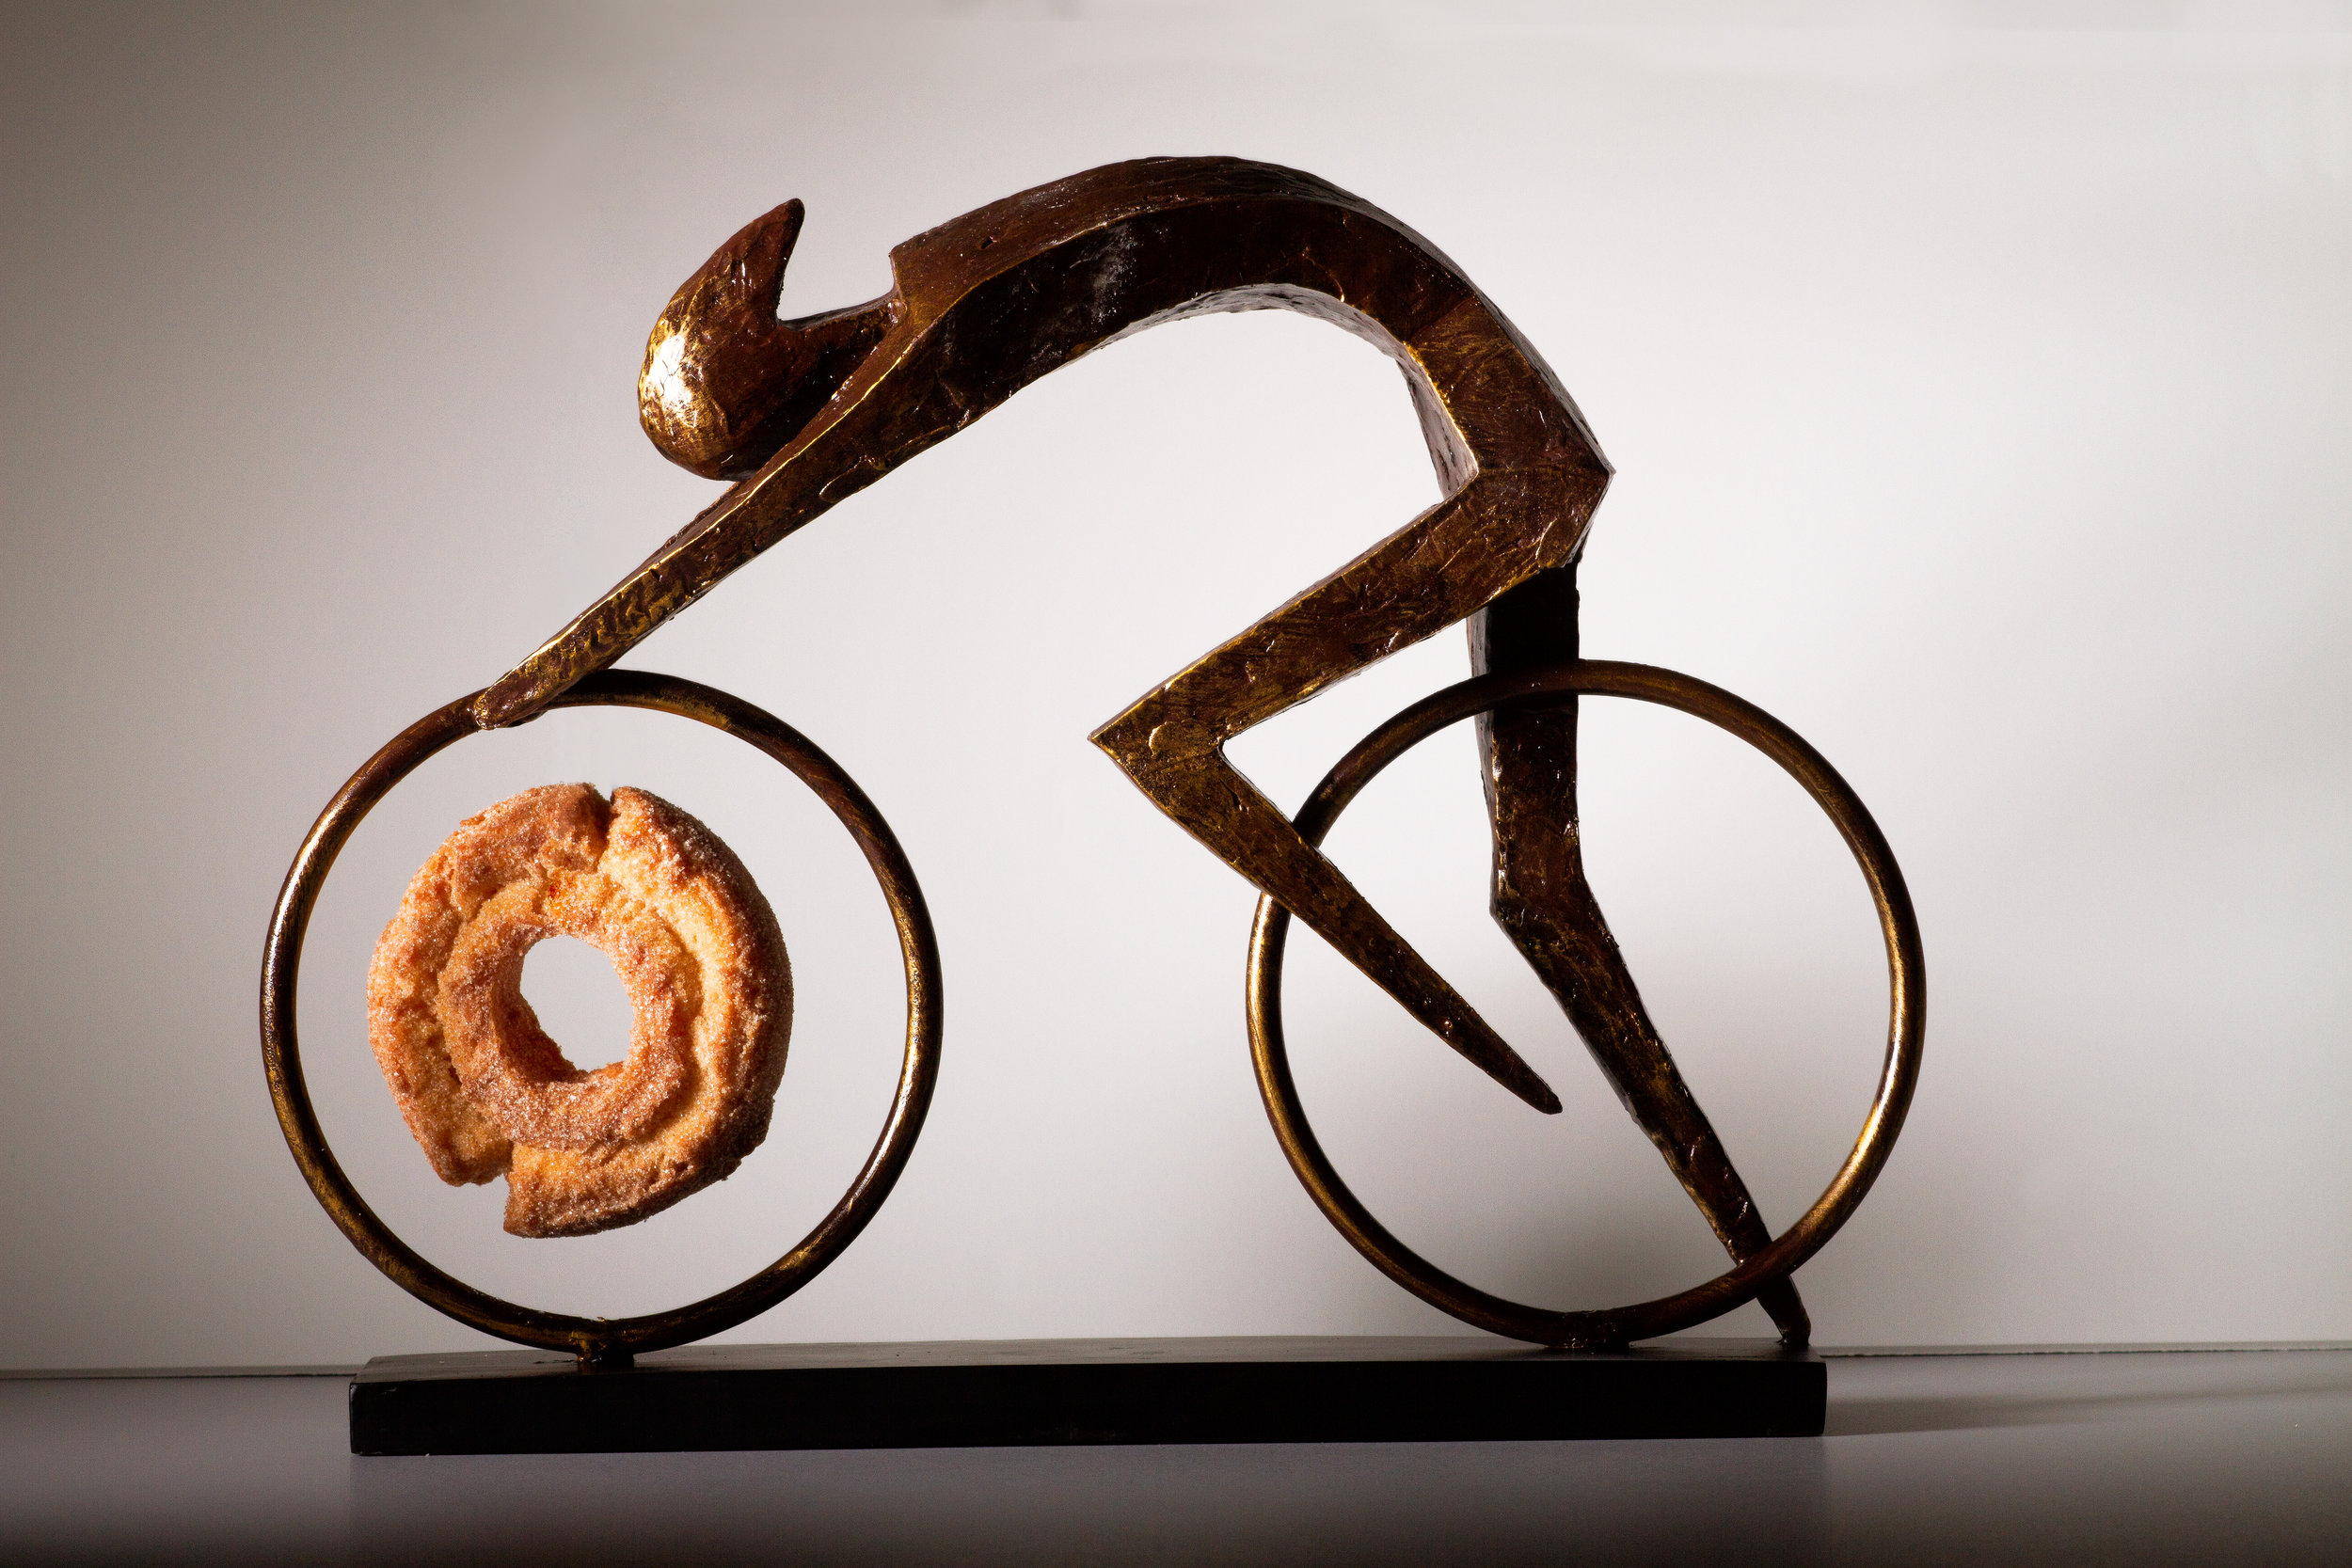 Biker Donut — Centrifugal Flow